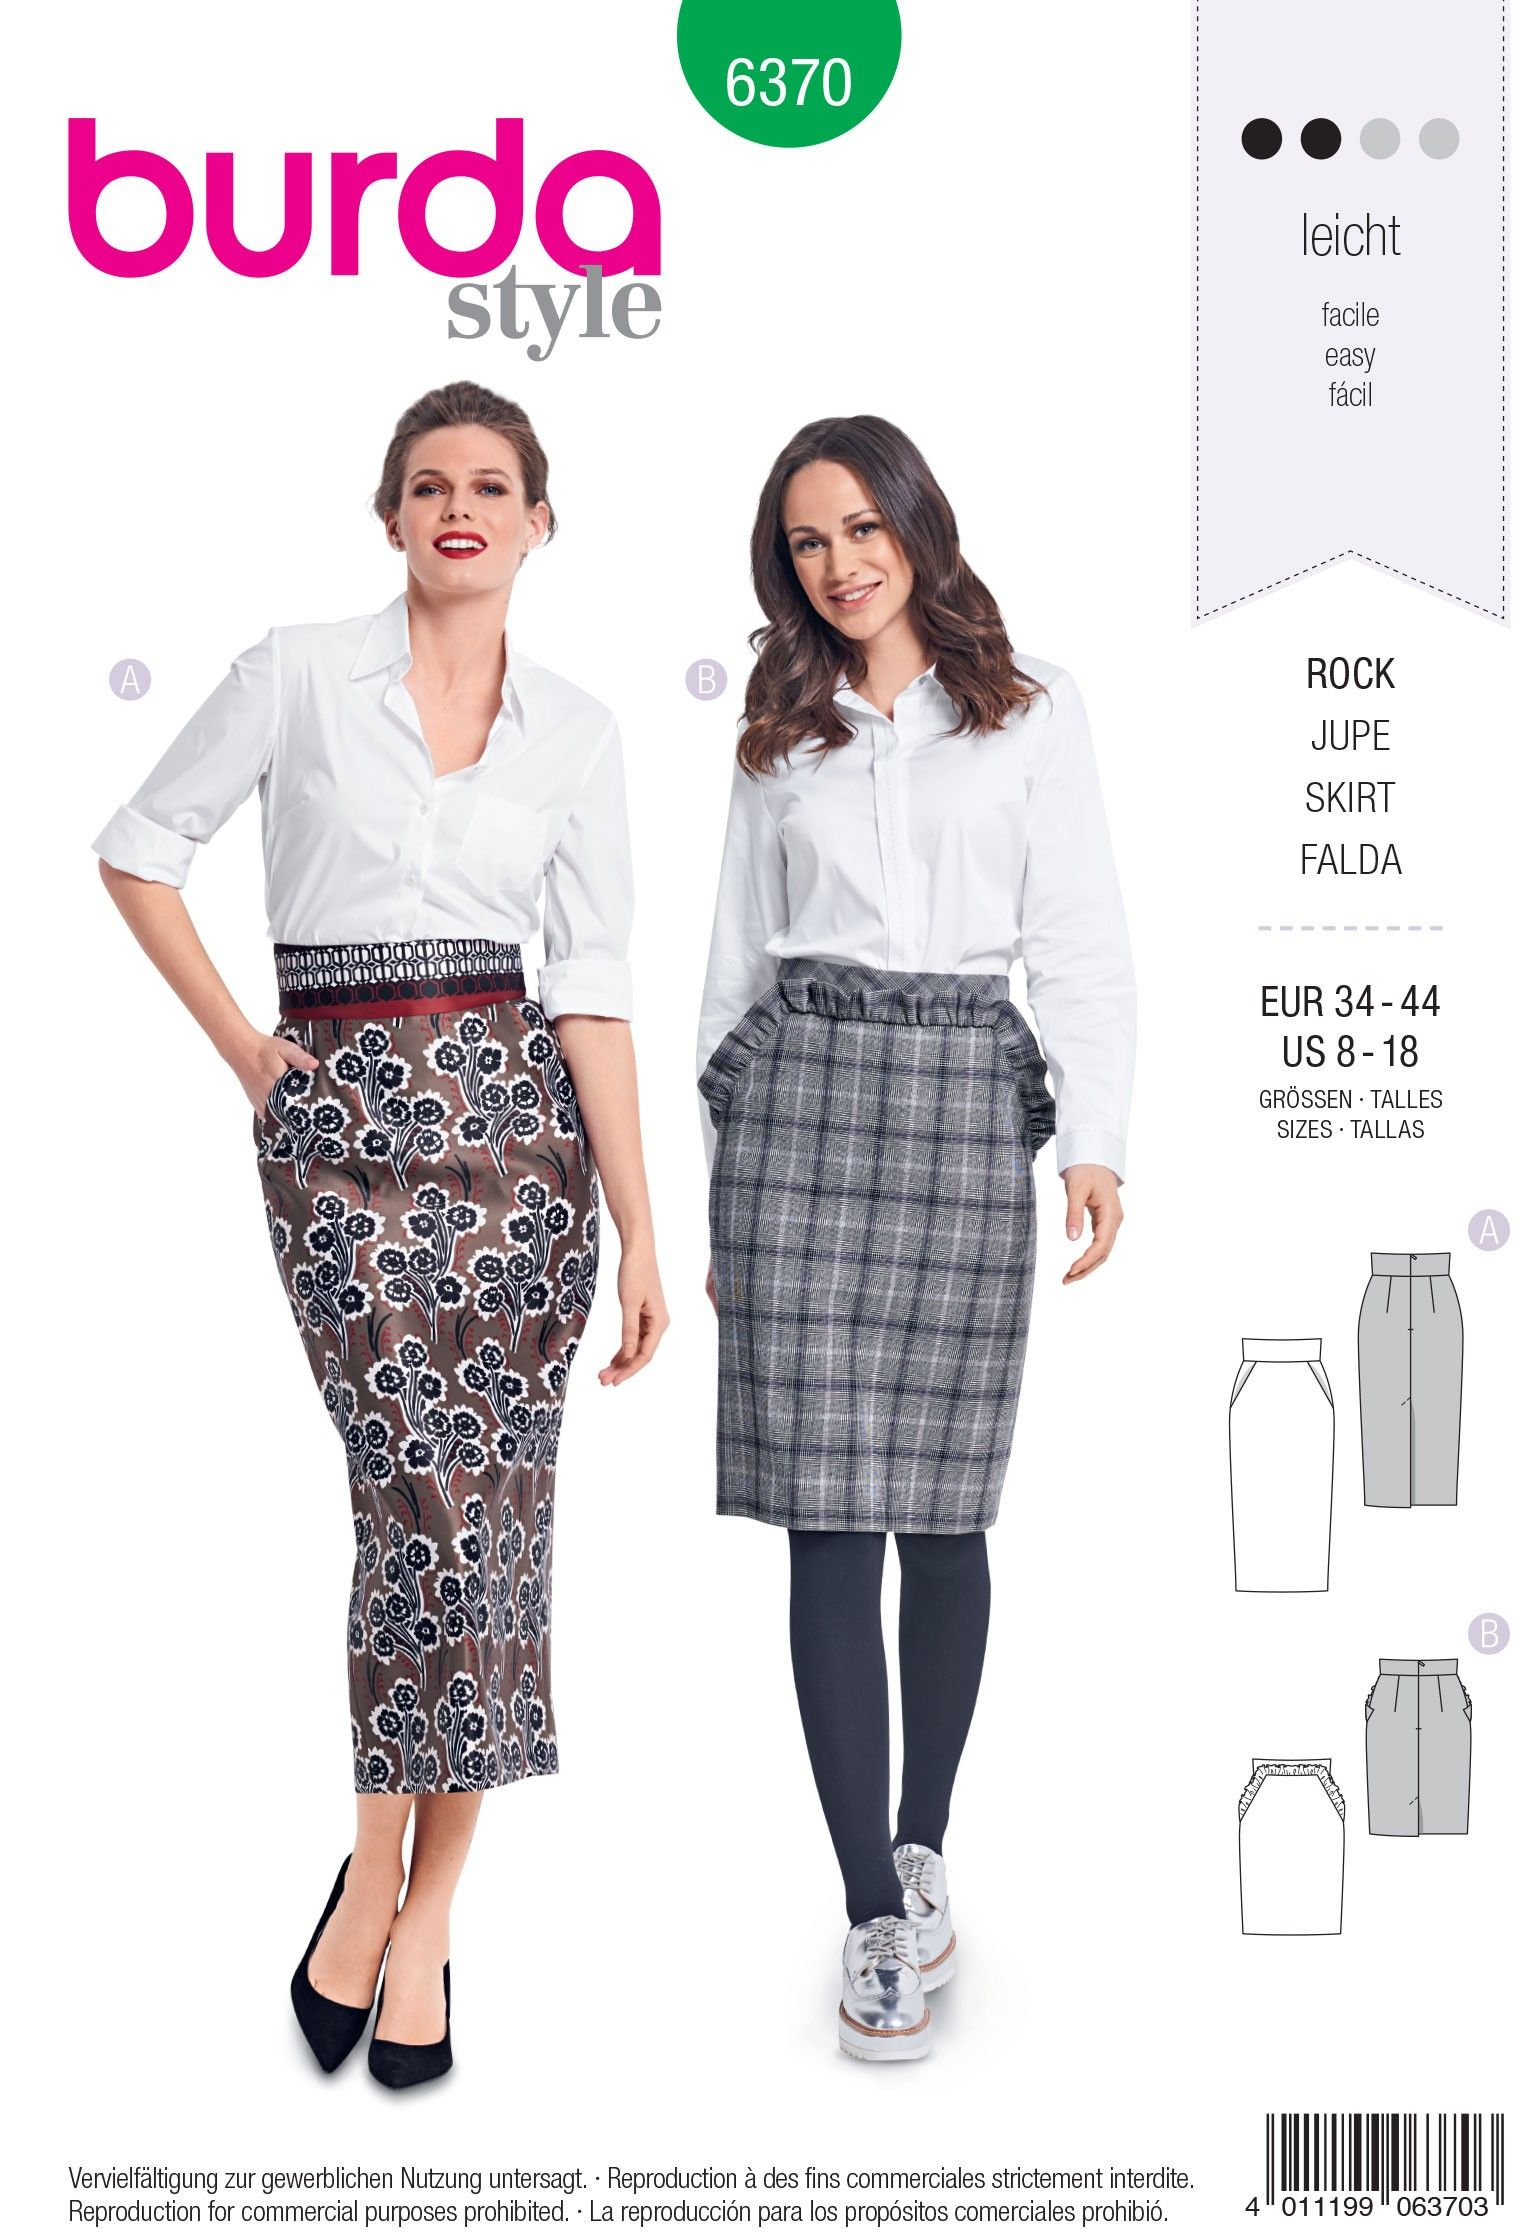 Burda Pattern 6370 Pencil Skirt with Pockets